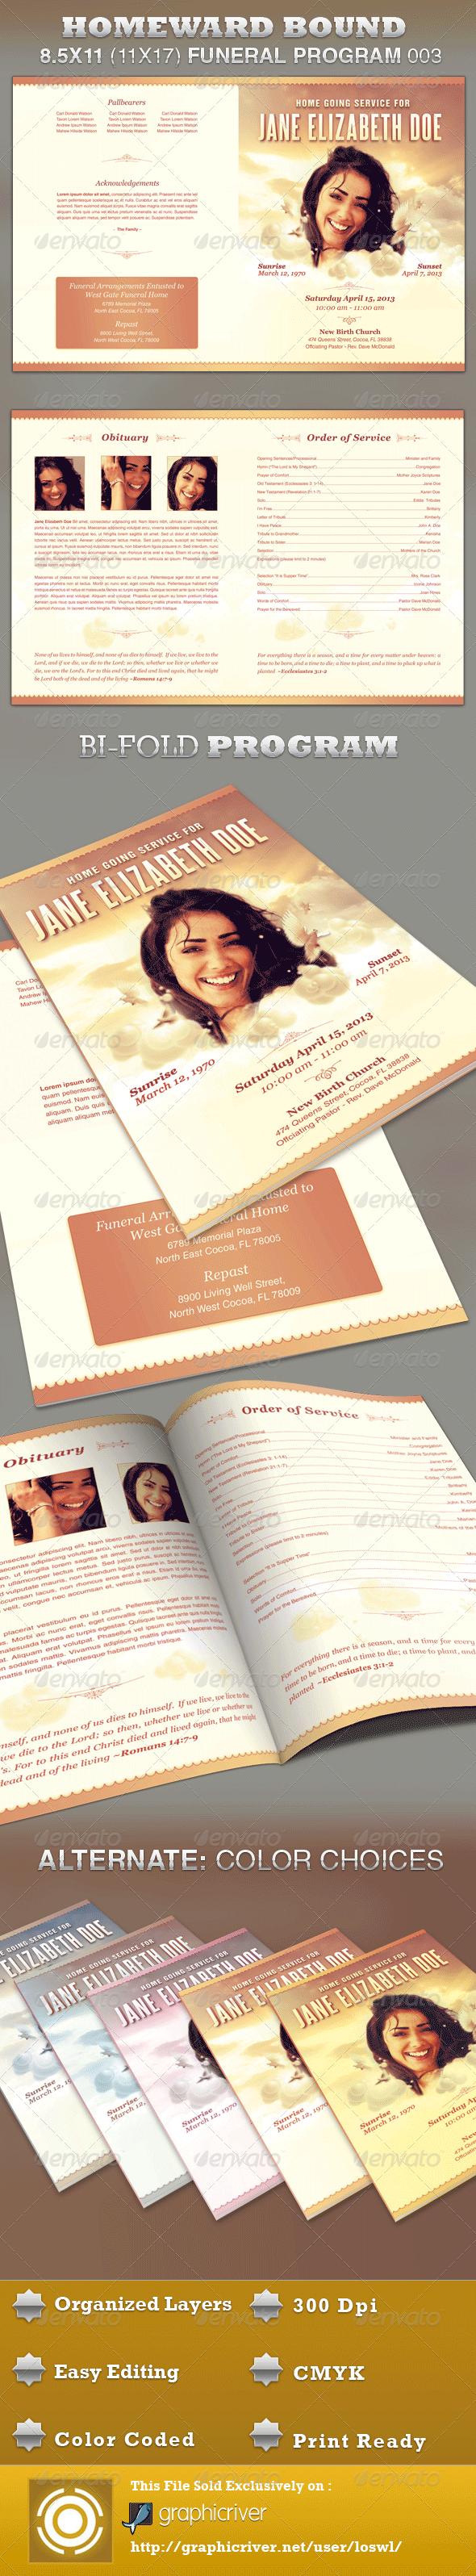 GraphicRiver Homeward Bound Funeral Program Template 003 3187927